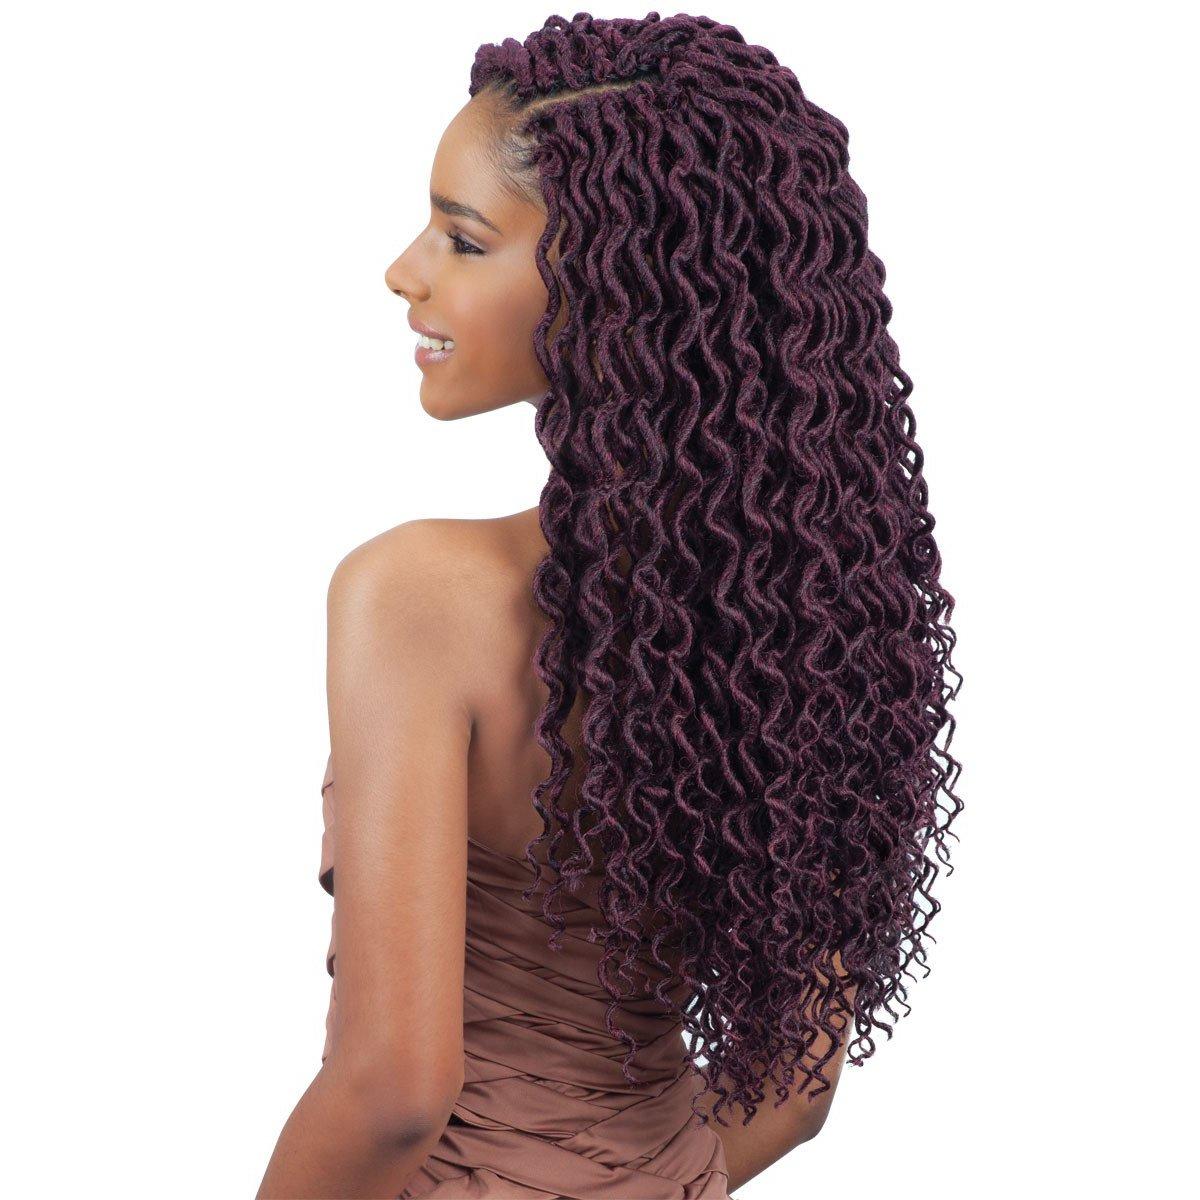 Amazon freetress 2x soft curly lite faux loc crochet amazon freetress 2x soft curly lite faux loc crochet synthetic braiding hair 12 1 beauty pmusecretfo Image collections